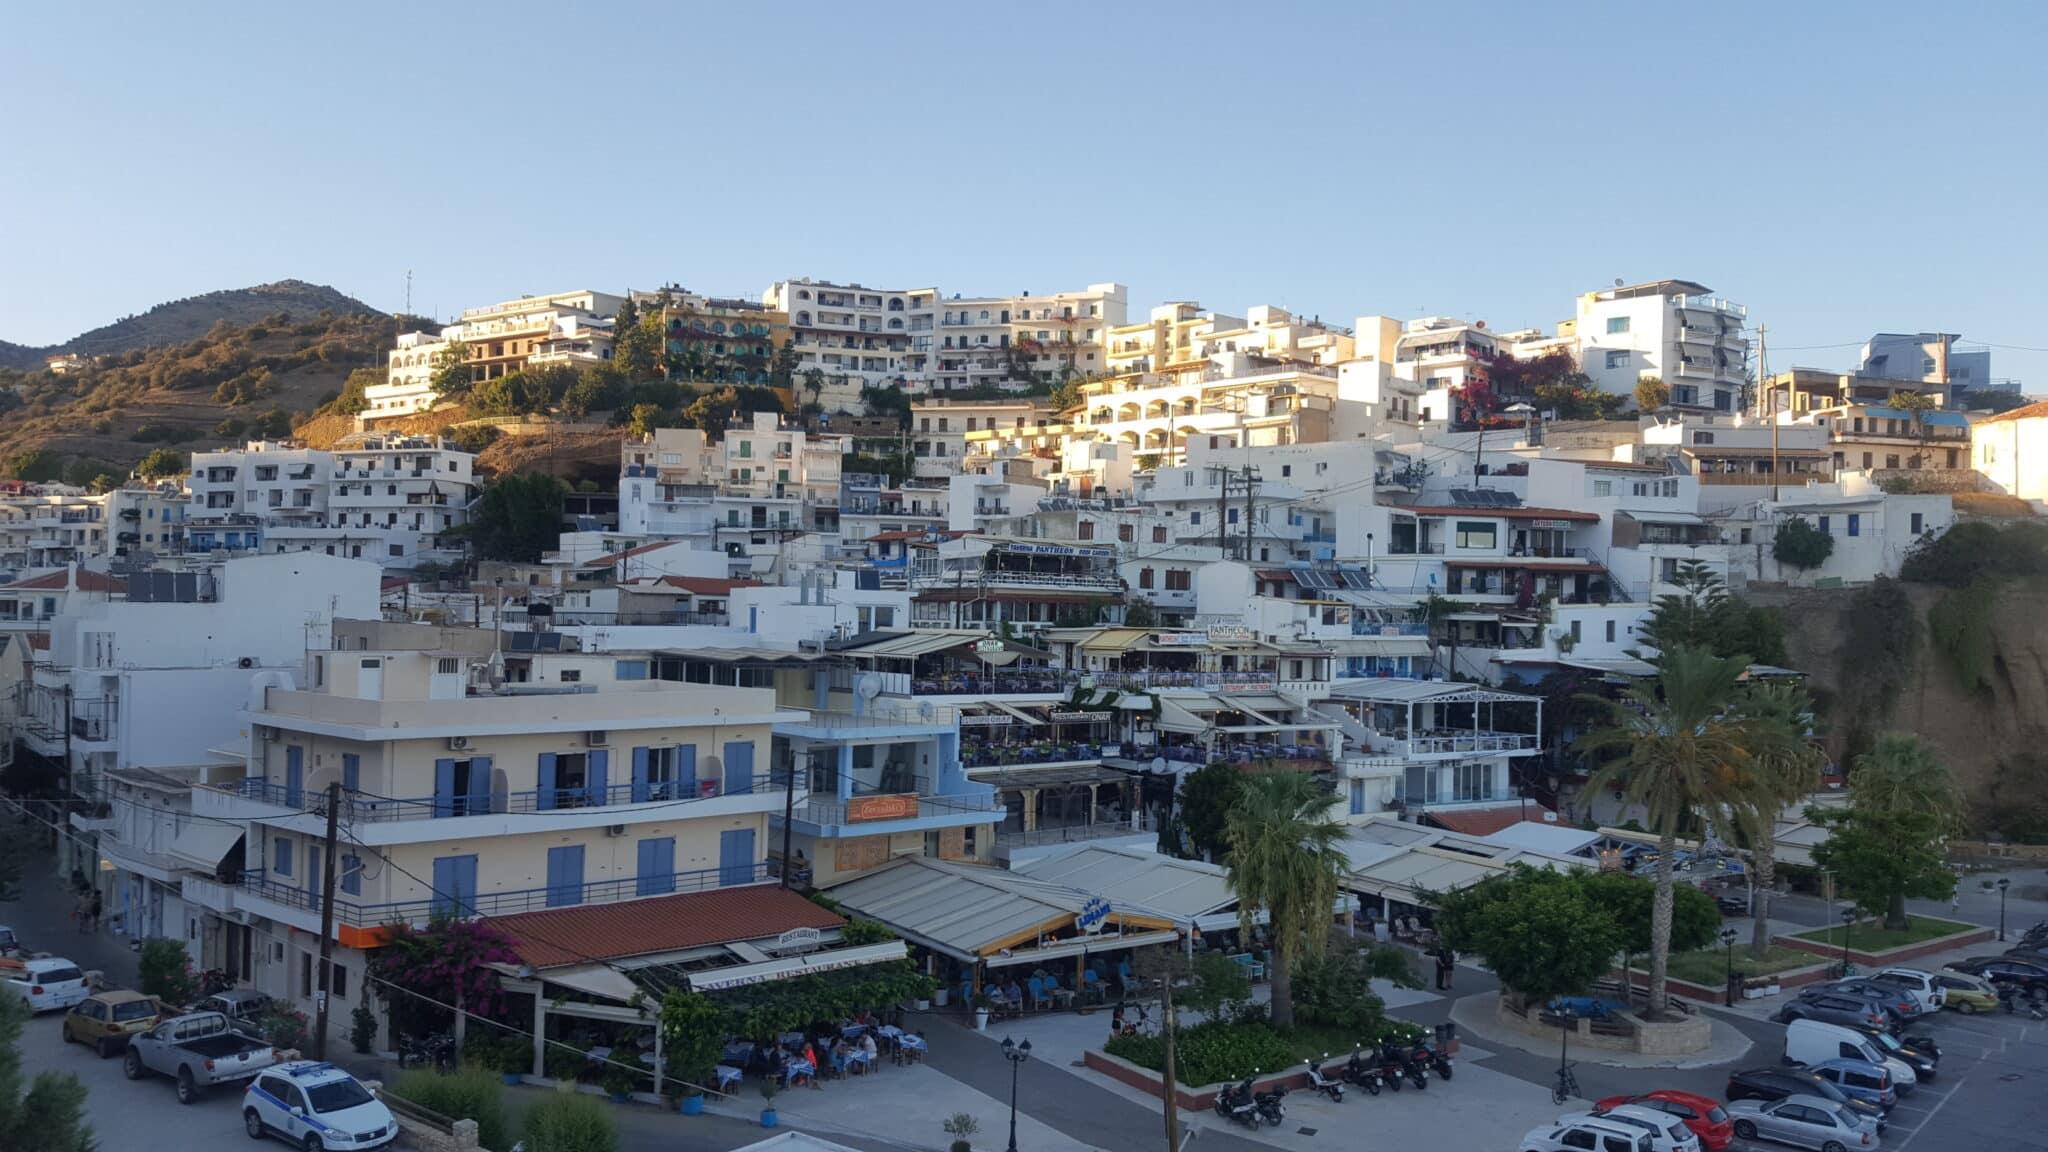 Het vissersdorpje Agia Galini